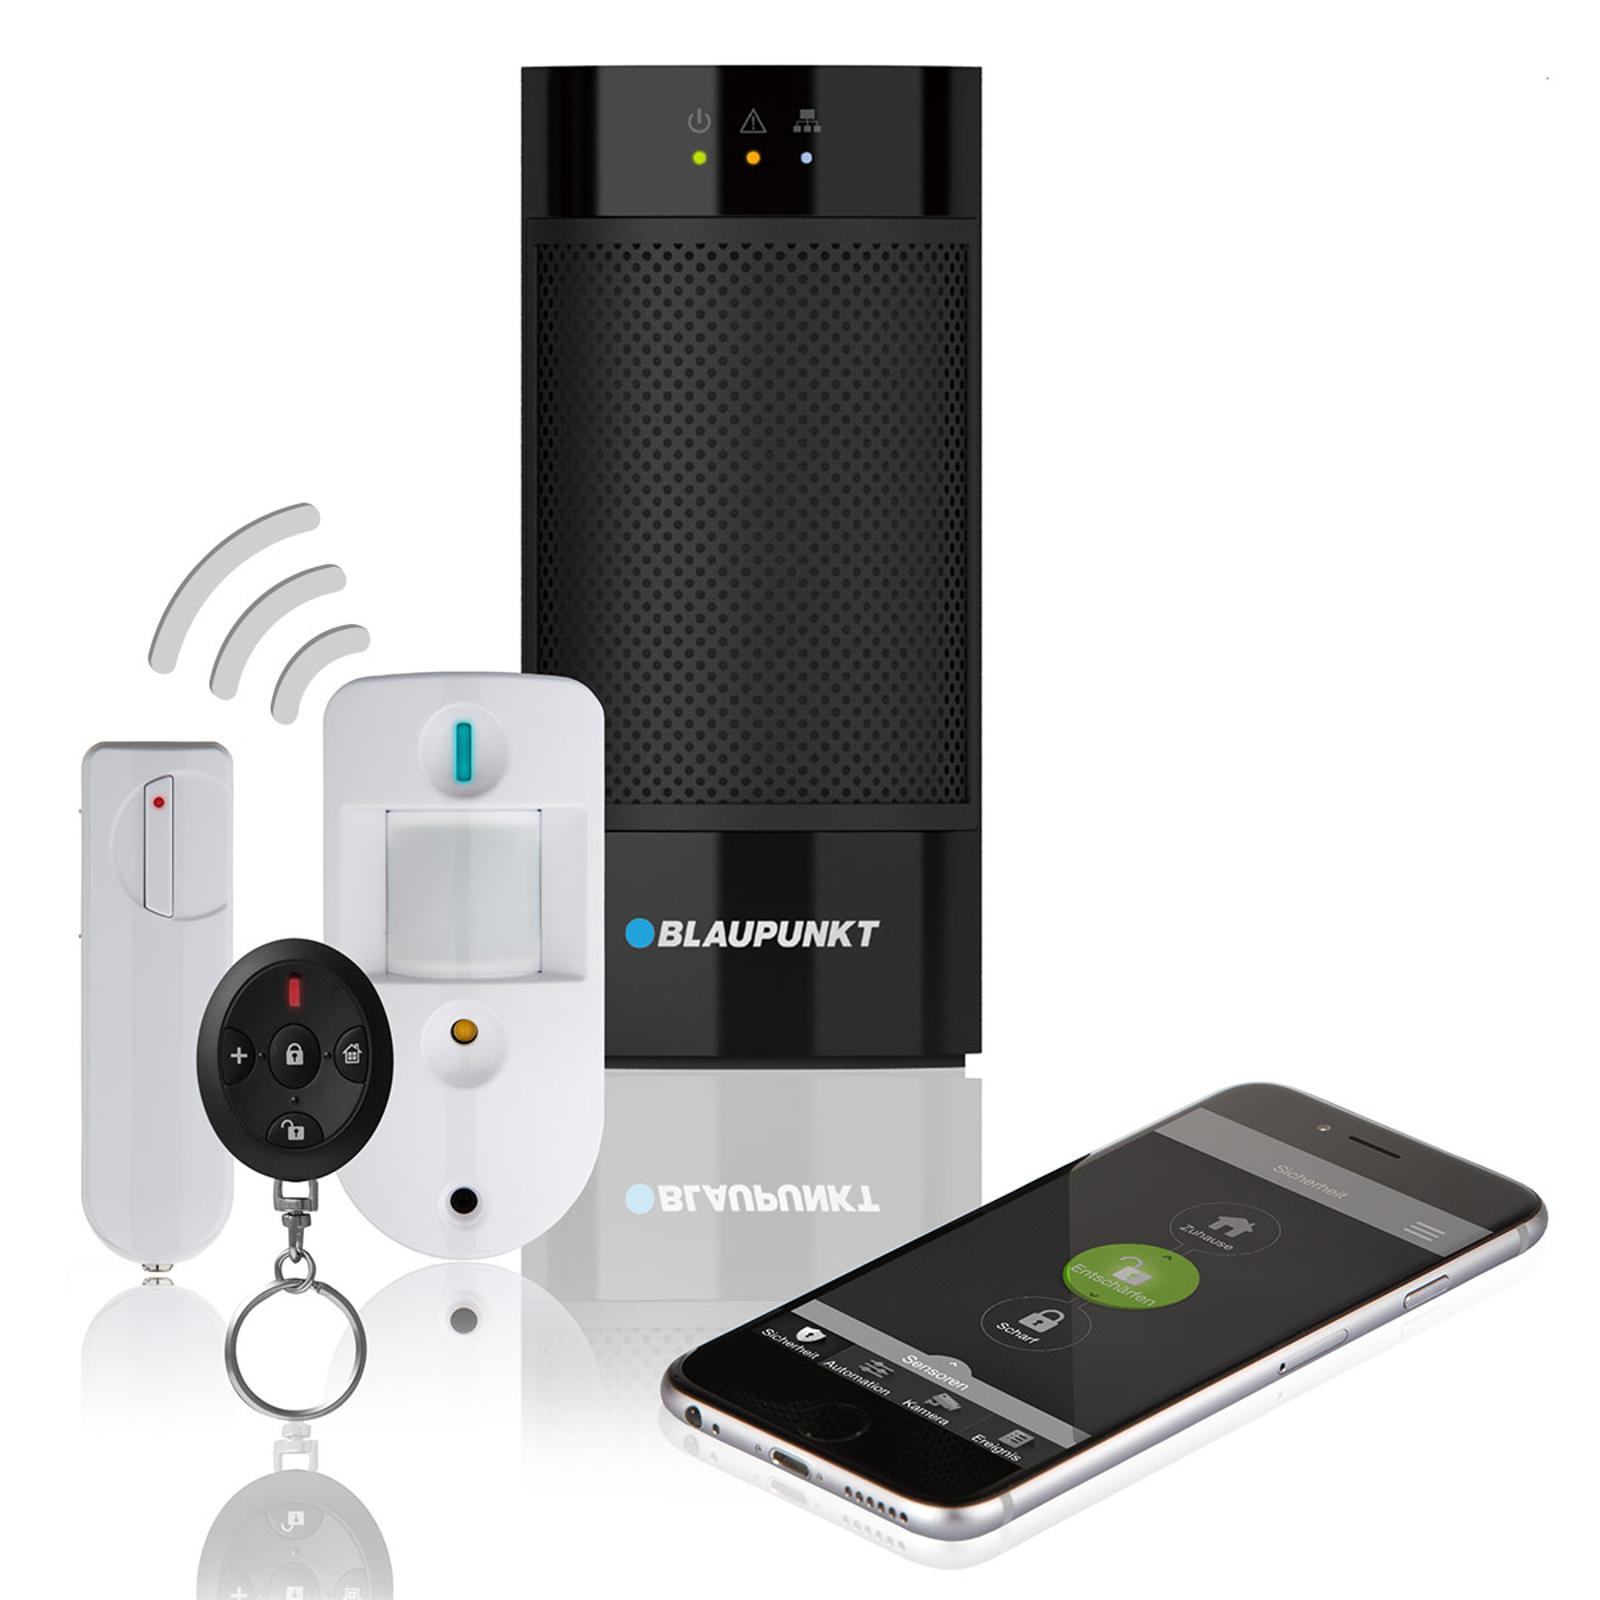 Blaupunkt Q3200 Funk-Alarmanlagen-Set mit Kamera